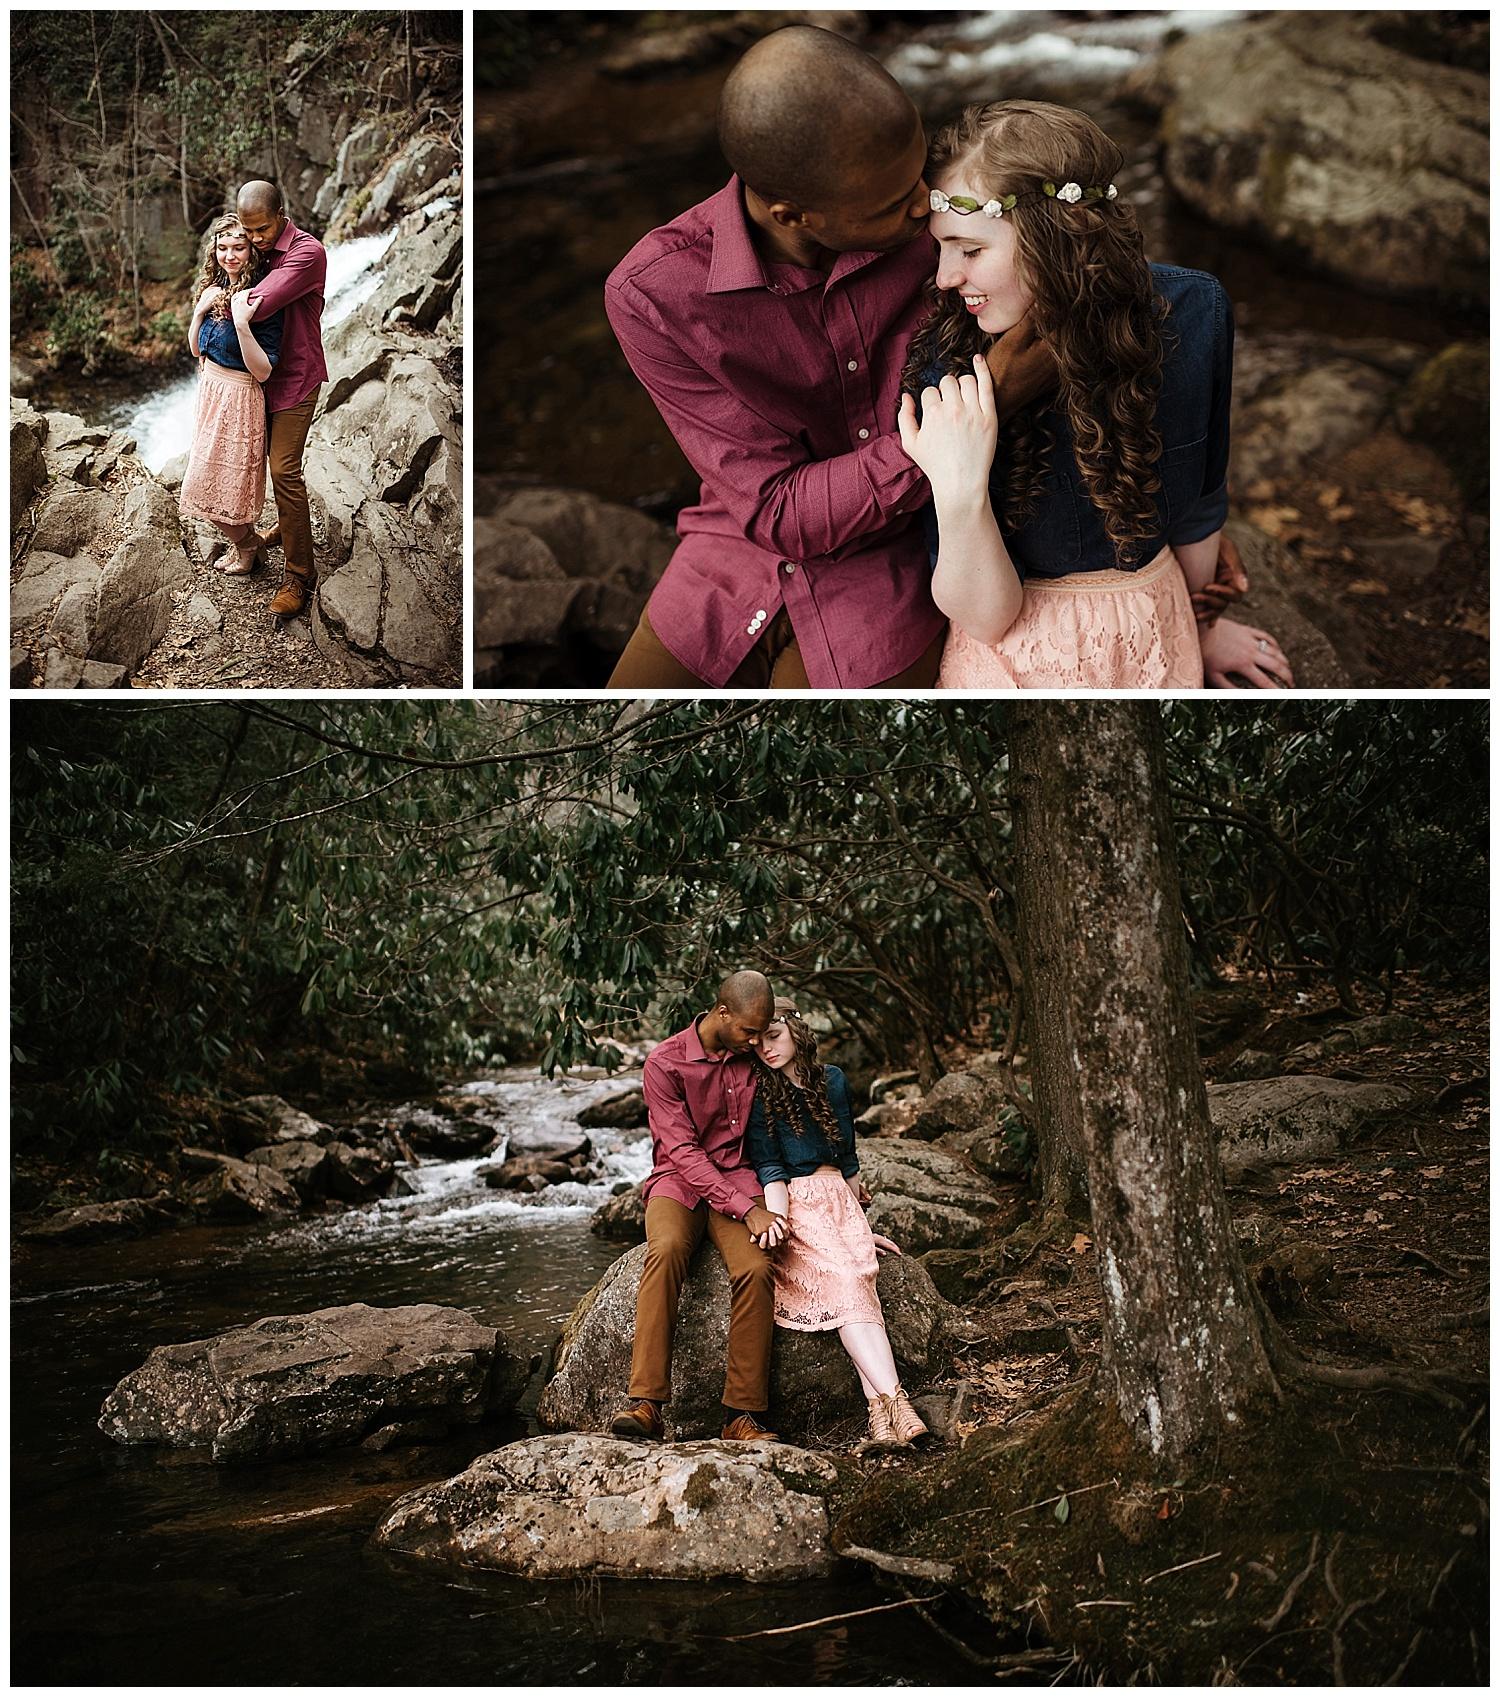 NEPA-Wedding-Engagement-Photographer-Hickory-Run-Hawk-Falls-Whitehaven-PA_0080.jpg